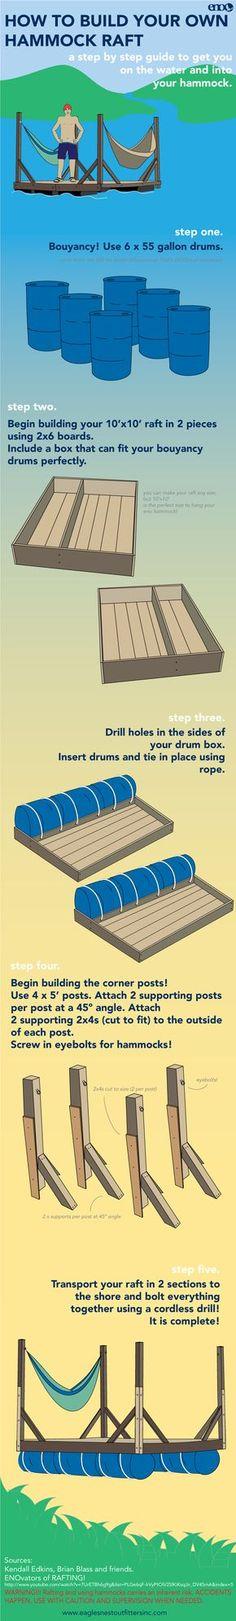 How to Build a Hammock Raft! Inspired By Kendall Edkins, Brian Blass + co. http://www.youtube.com/watch?v=7UrETBh6g9g=PLGe6qF-lrVyPtOiV2SlKiKsqJn_DV45mA=5